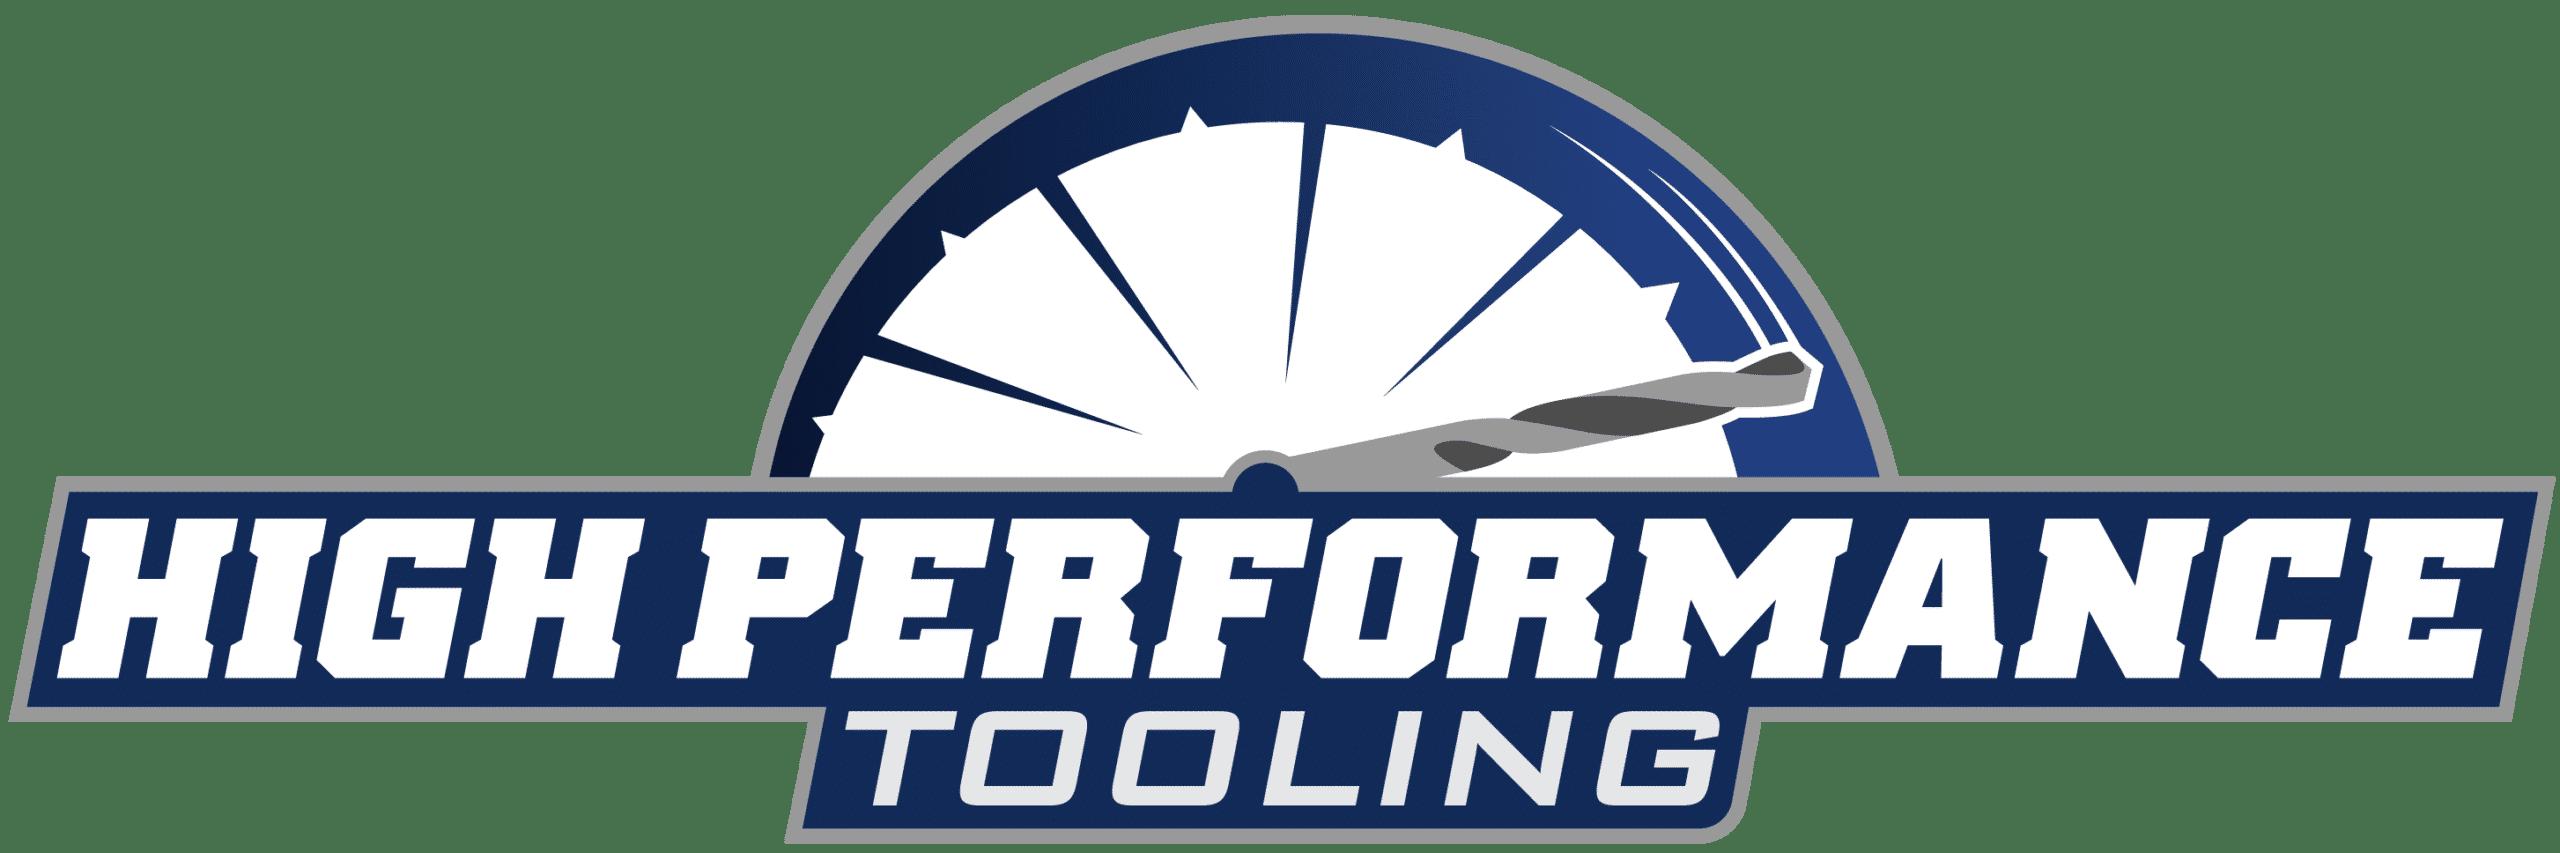 High Performance Tooling Logo-01